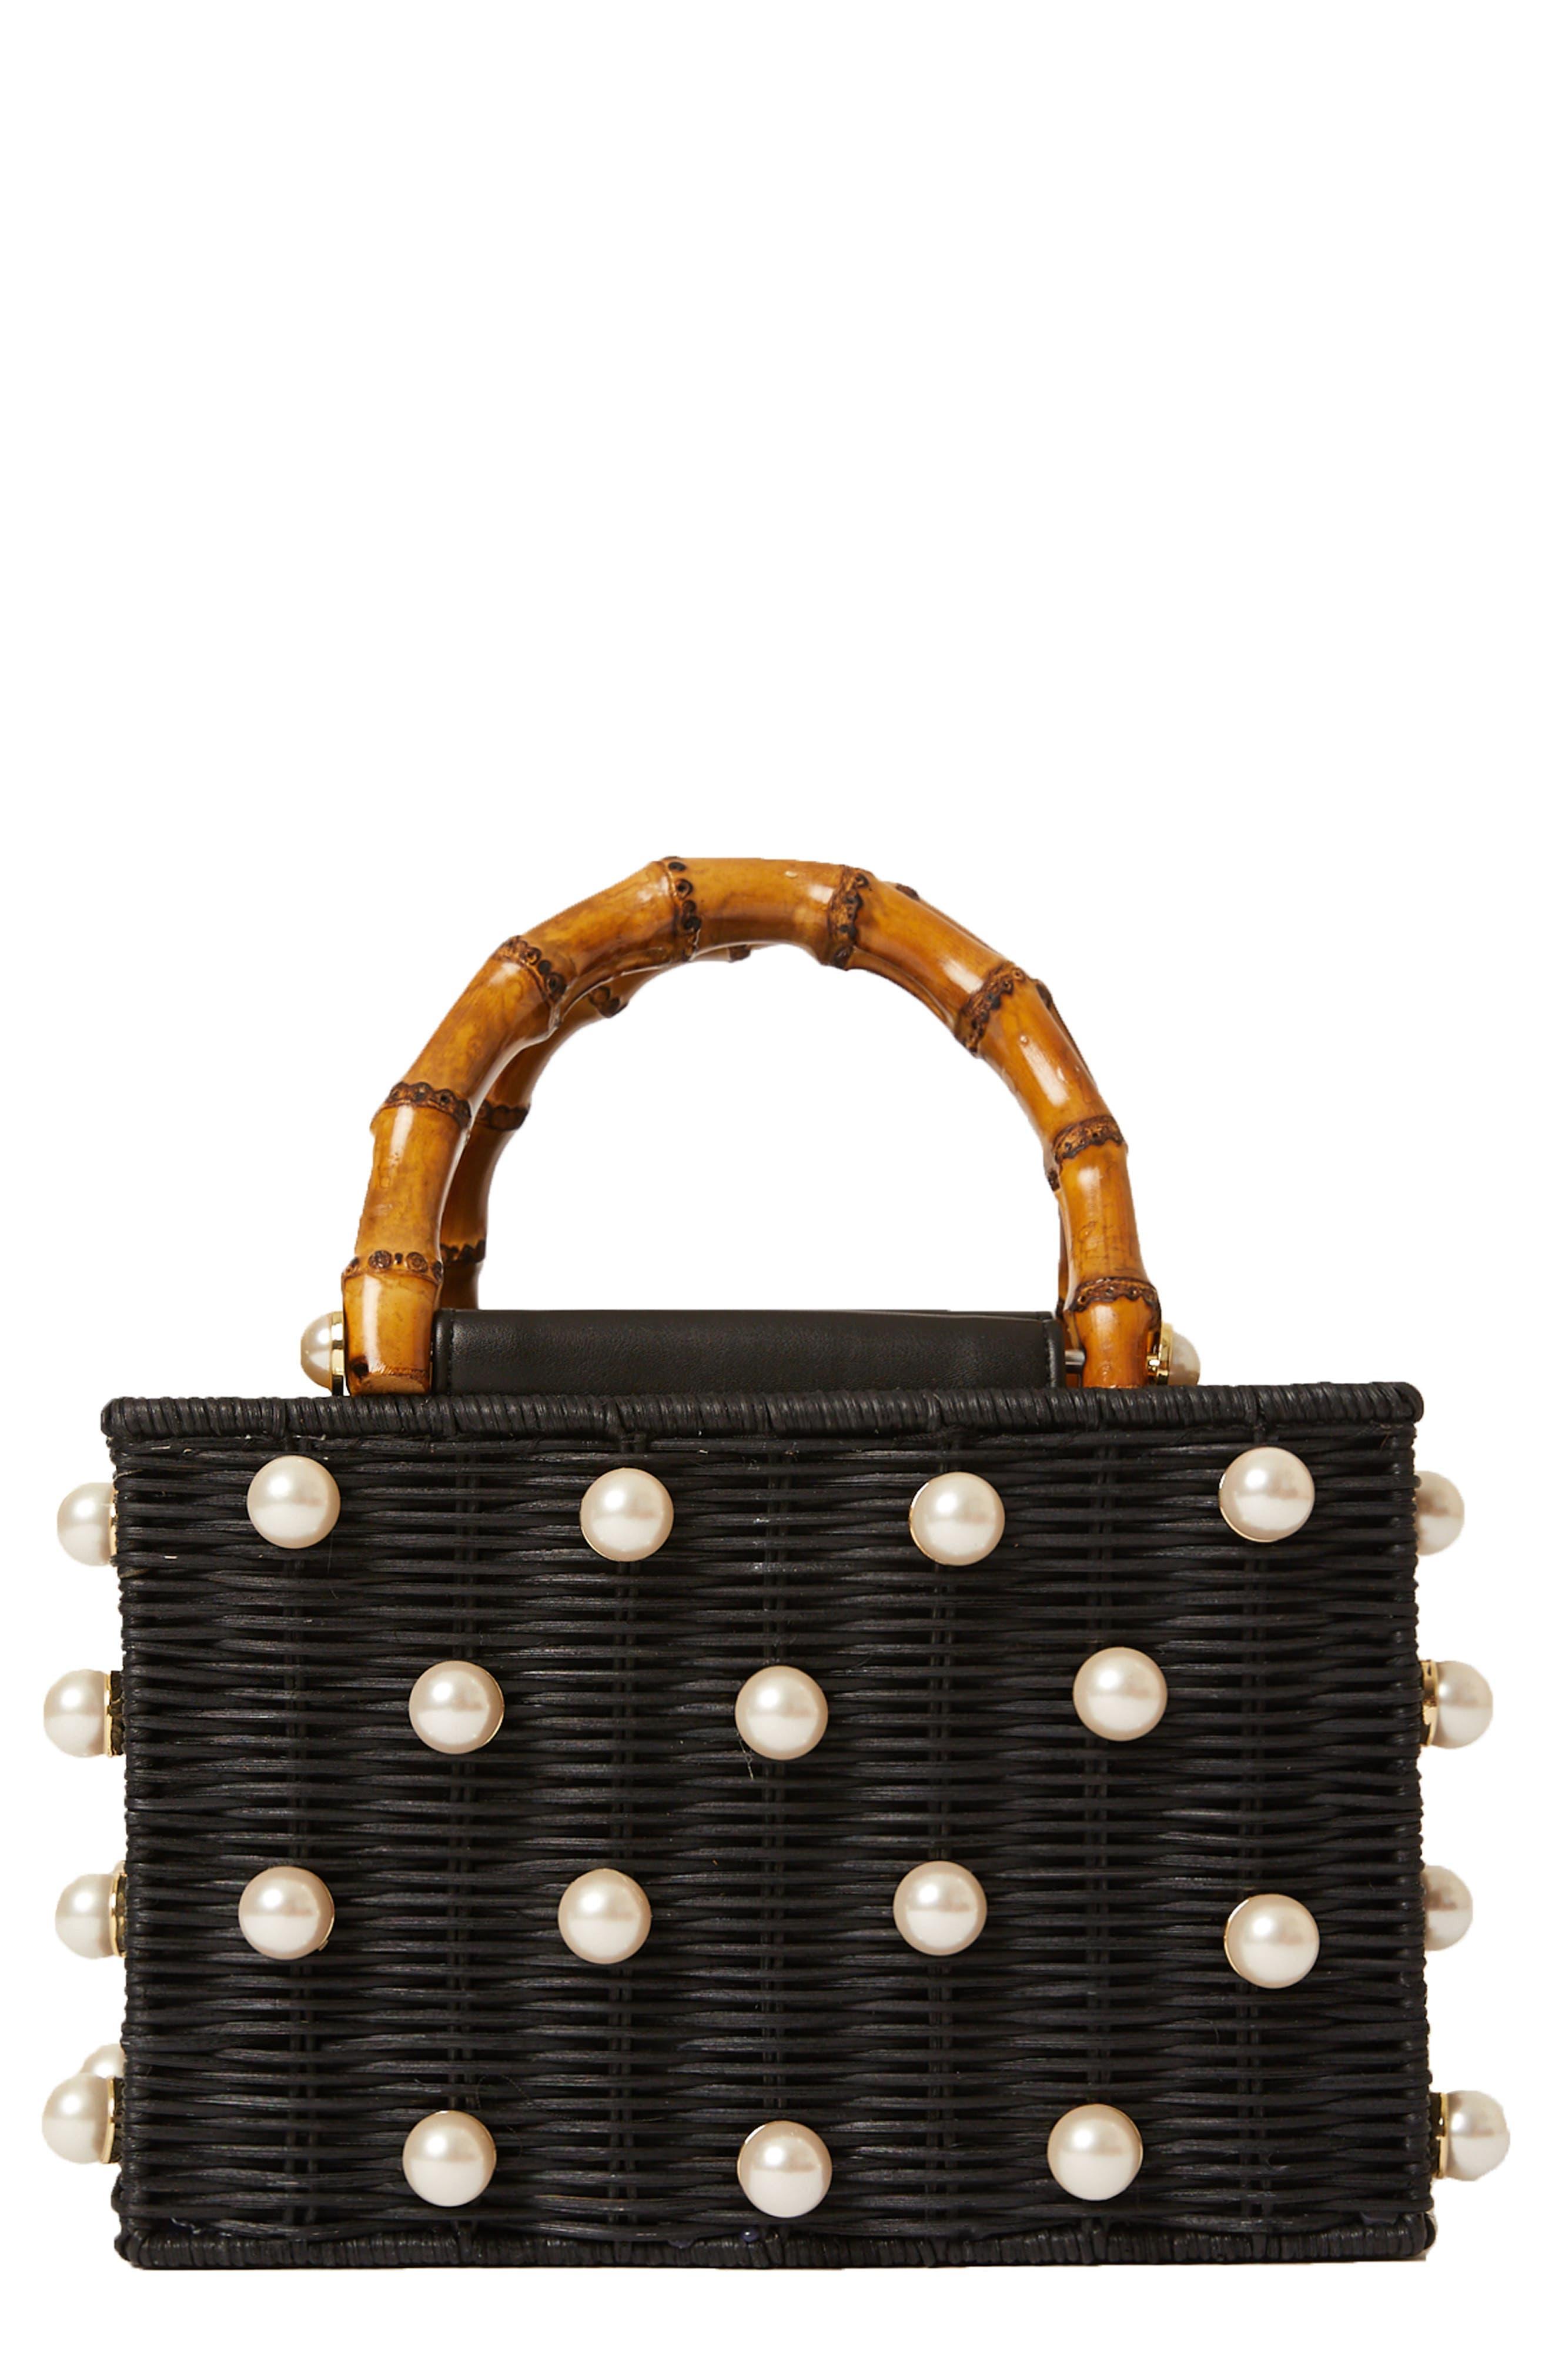 Chloe Imitation Pearl Rattan Bag